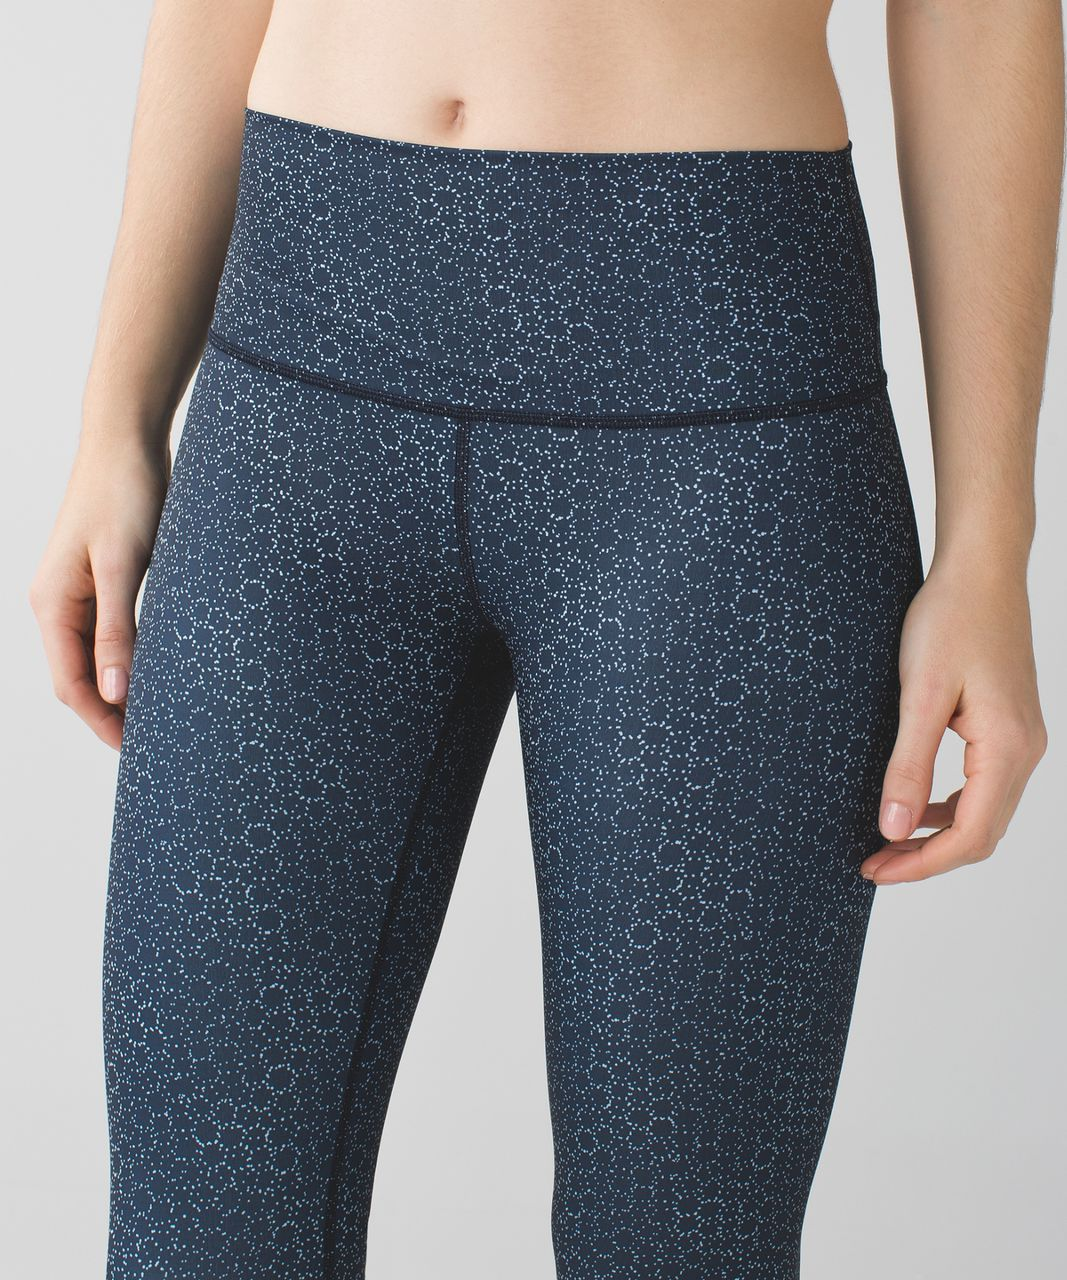 Lululemon High Times Pant *Full-On Luxtreme - Star Pixel Aquamarine Naval Blue